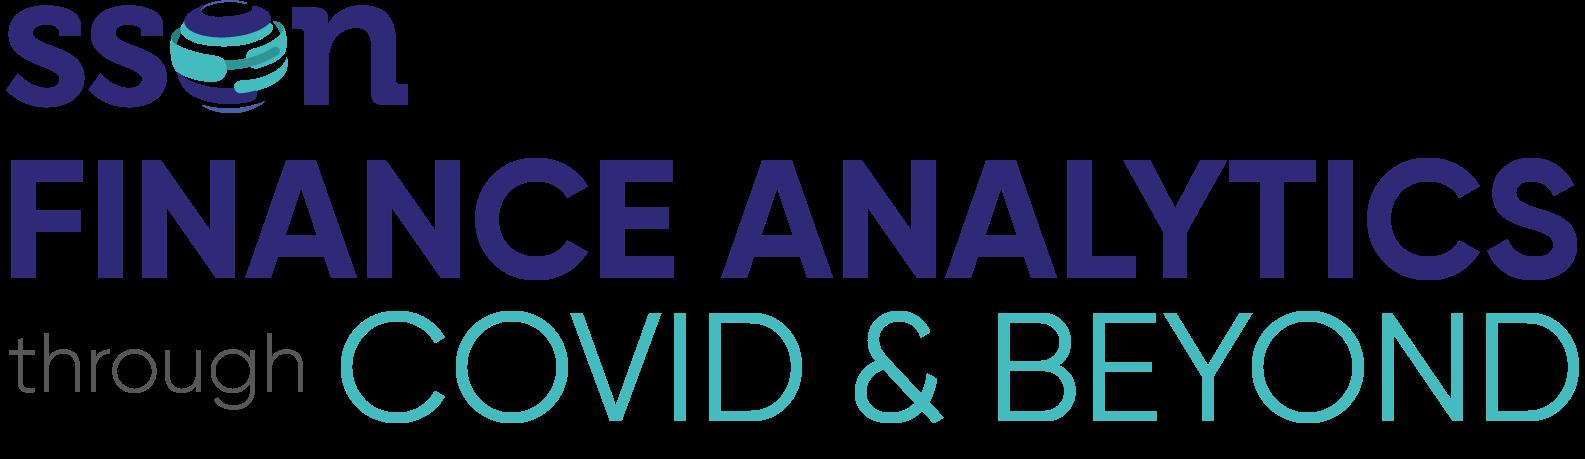 Finance Analytics: Through Covid-19 & Beyond